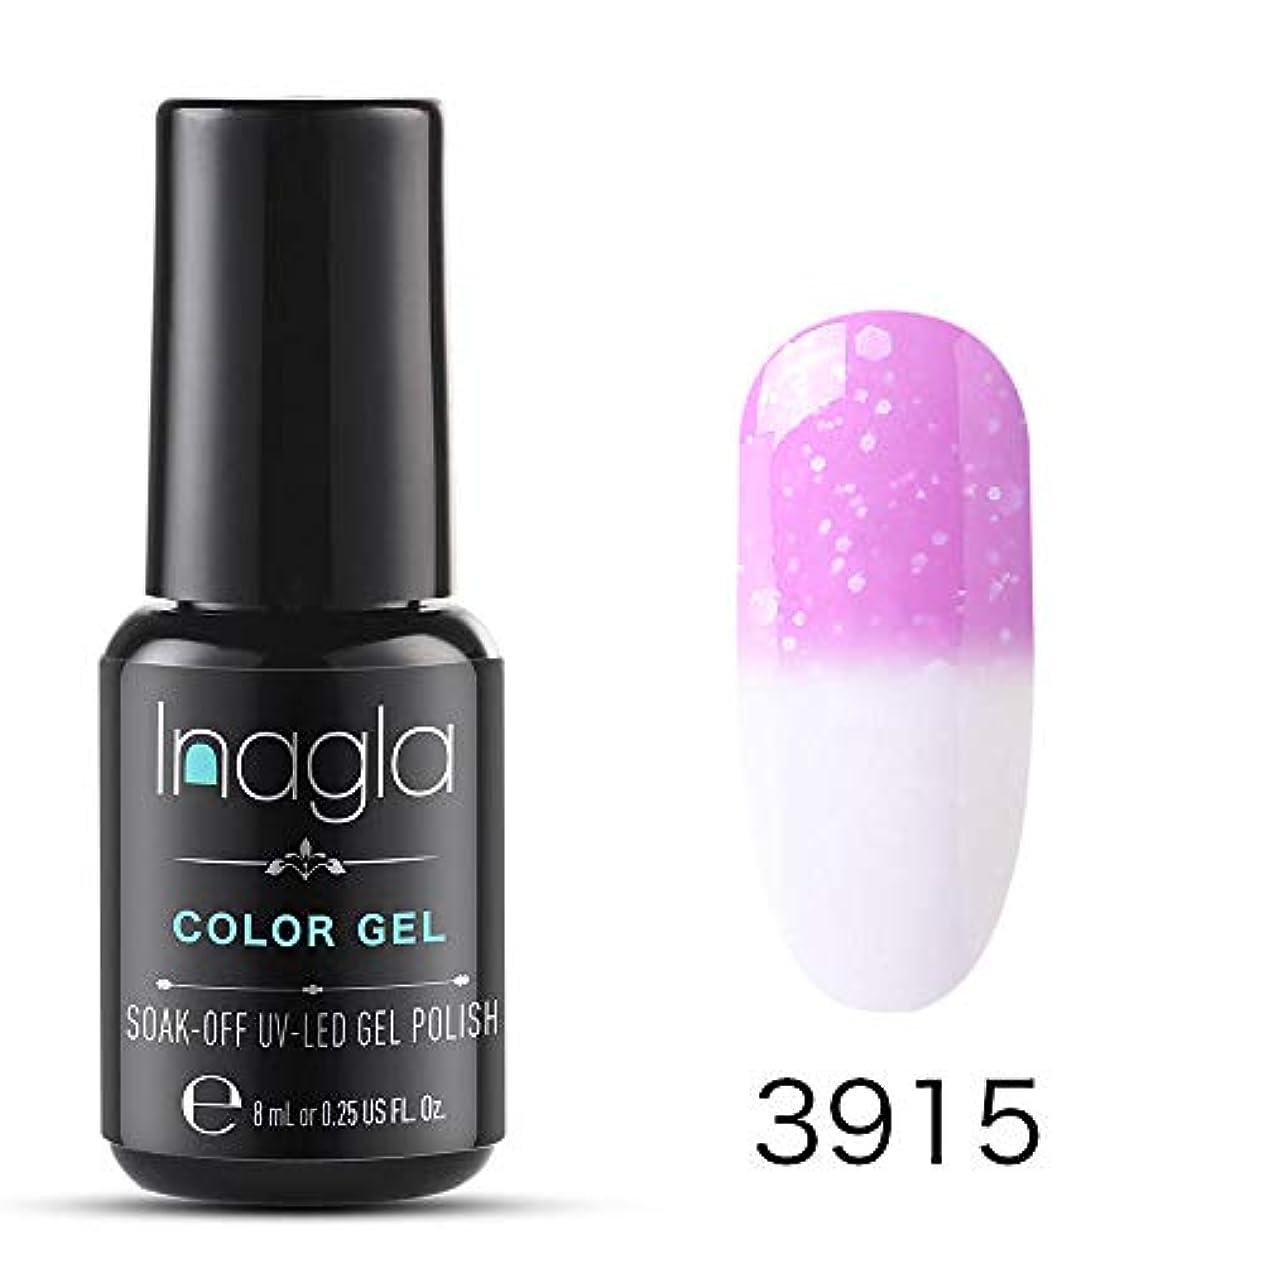 Inagla ジェルネイル カラージェル 雪花 カメレオンカラージェル 温度により色が変化 1色入り 8ml 【全30色選択可】